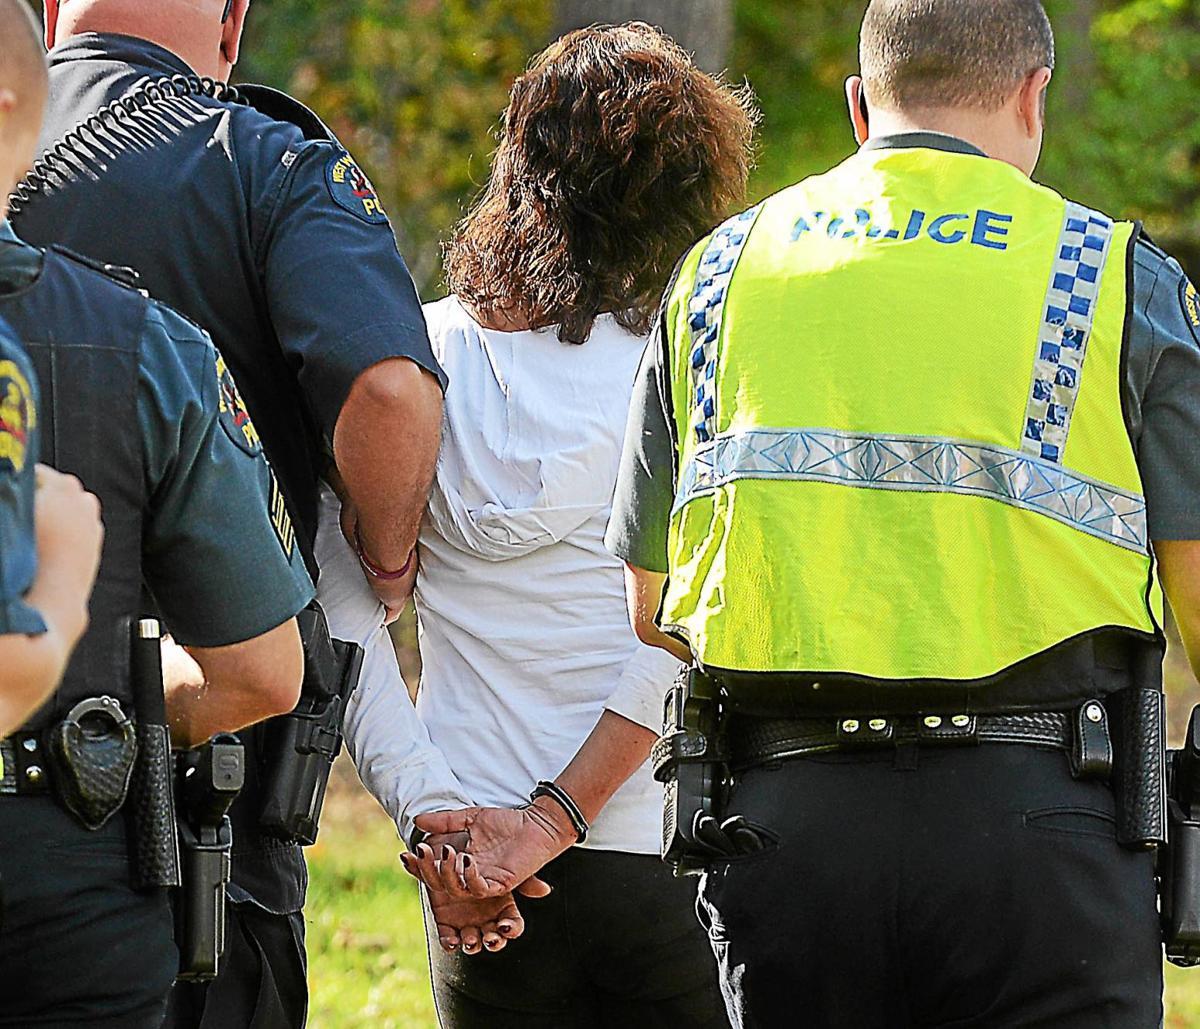 woman under arrest